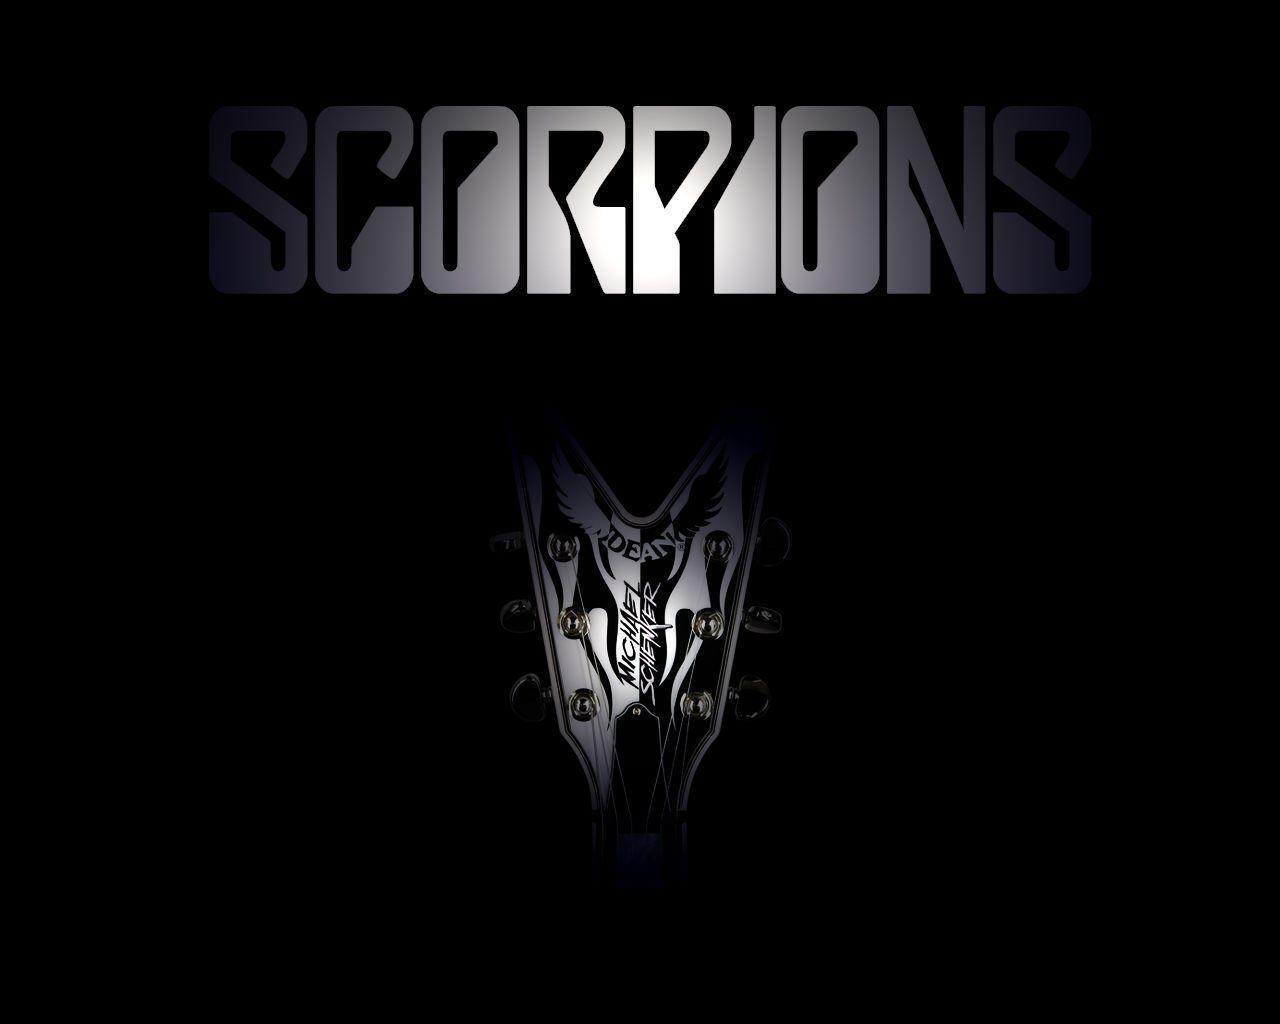 scorpions wallpapers wallpaper cave